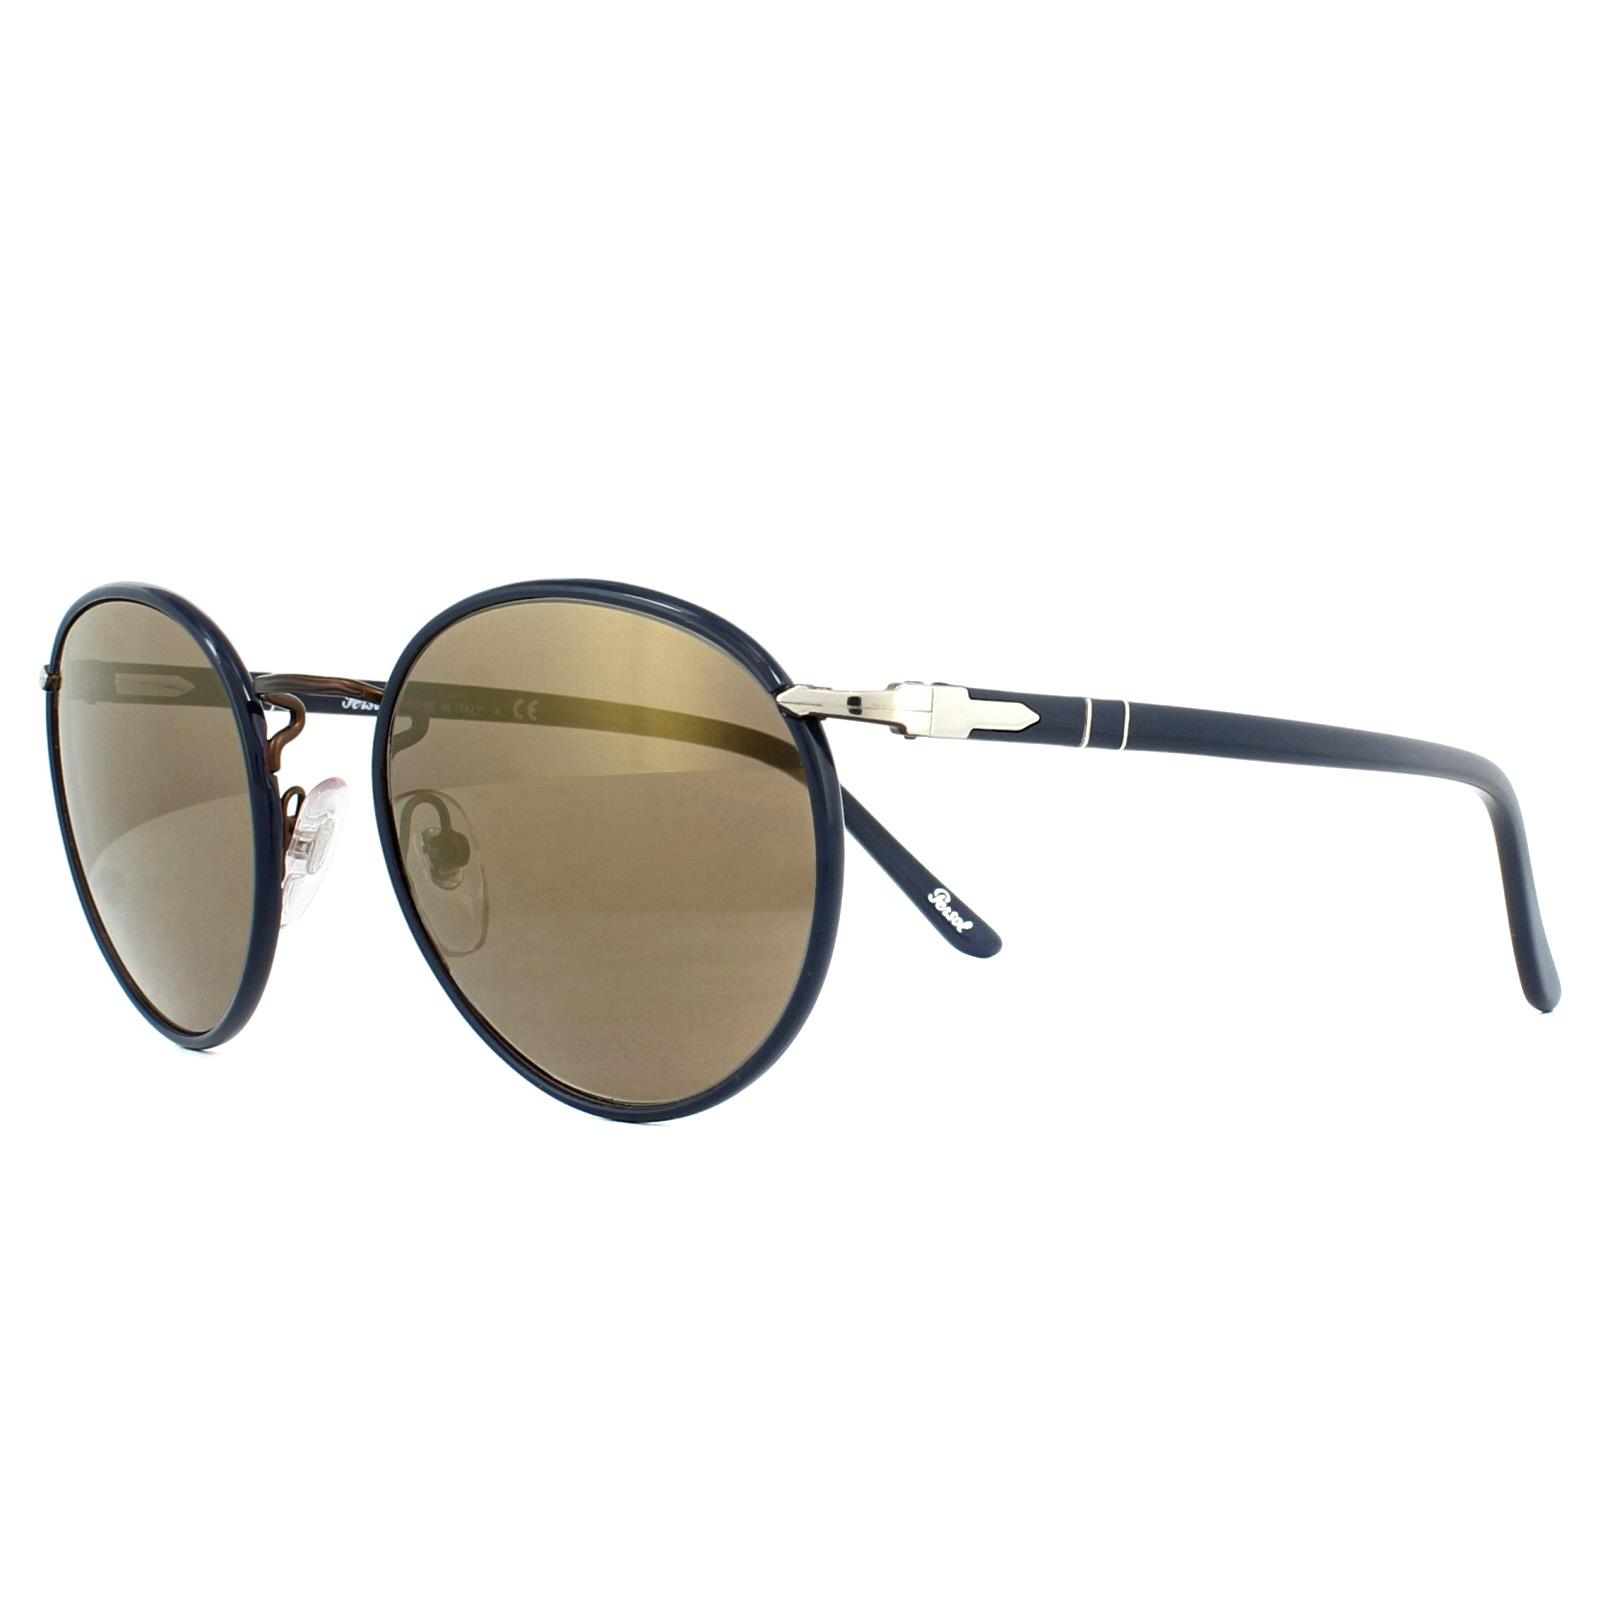 cb33cc2198b08 Sentinel Persol Sunglasses 2422SJ 1062O3 Brown Brown Gold Mirror